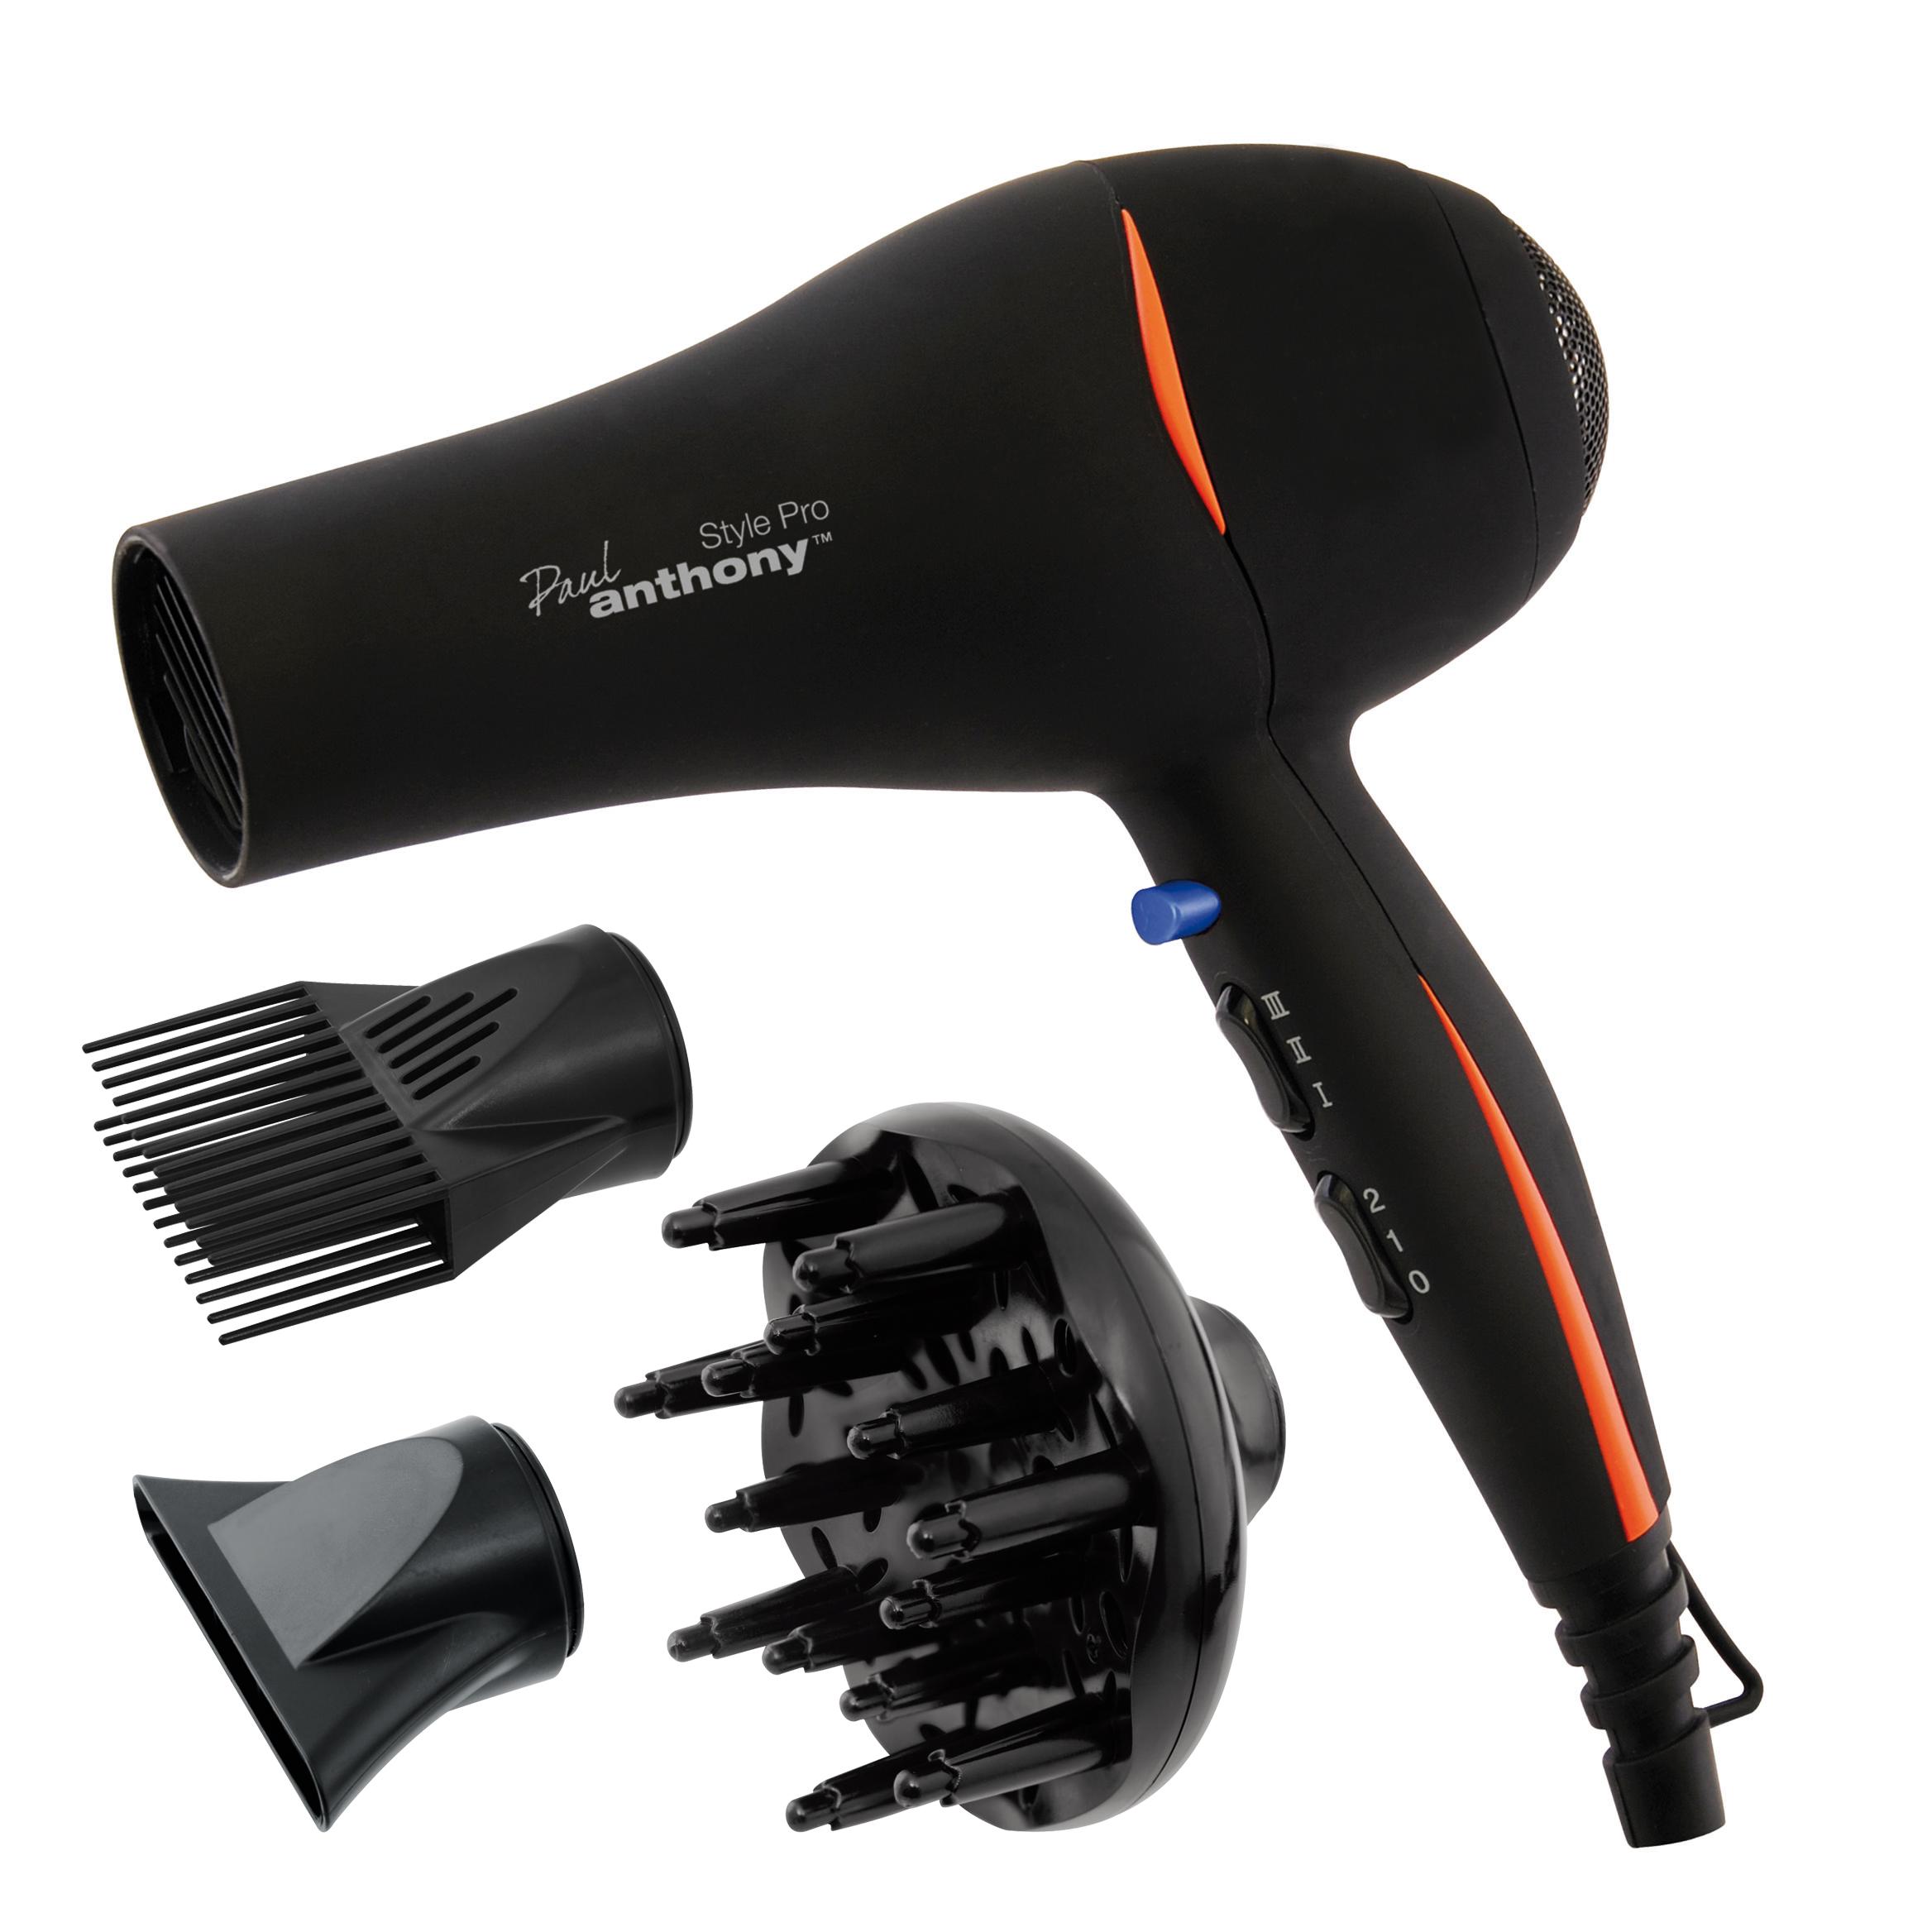 Hair Dryer Diffuser ~ New lloytron black paul anthony style pro w hair dryer